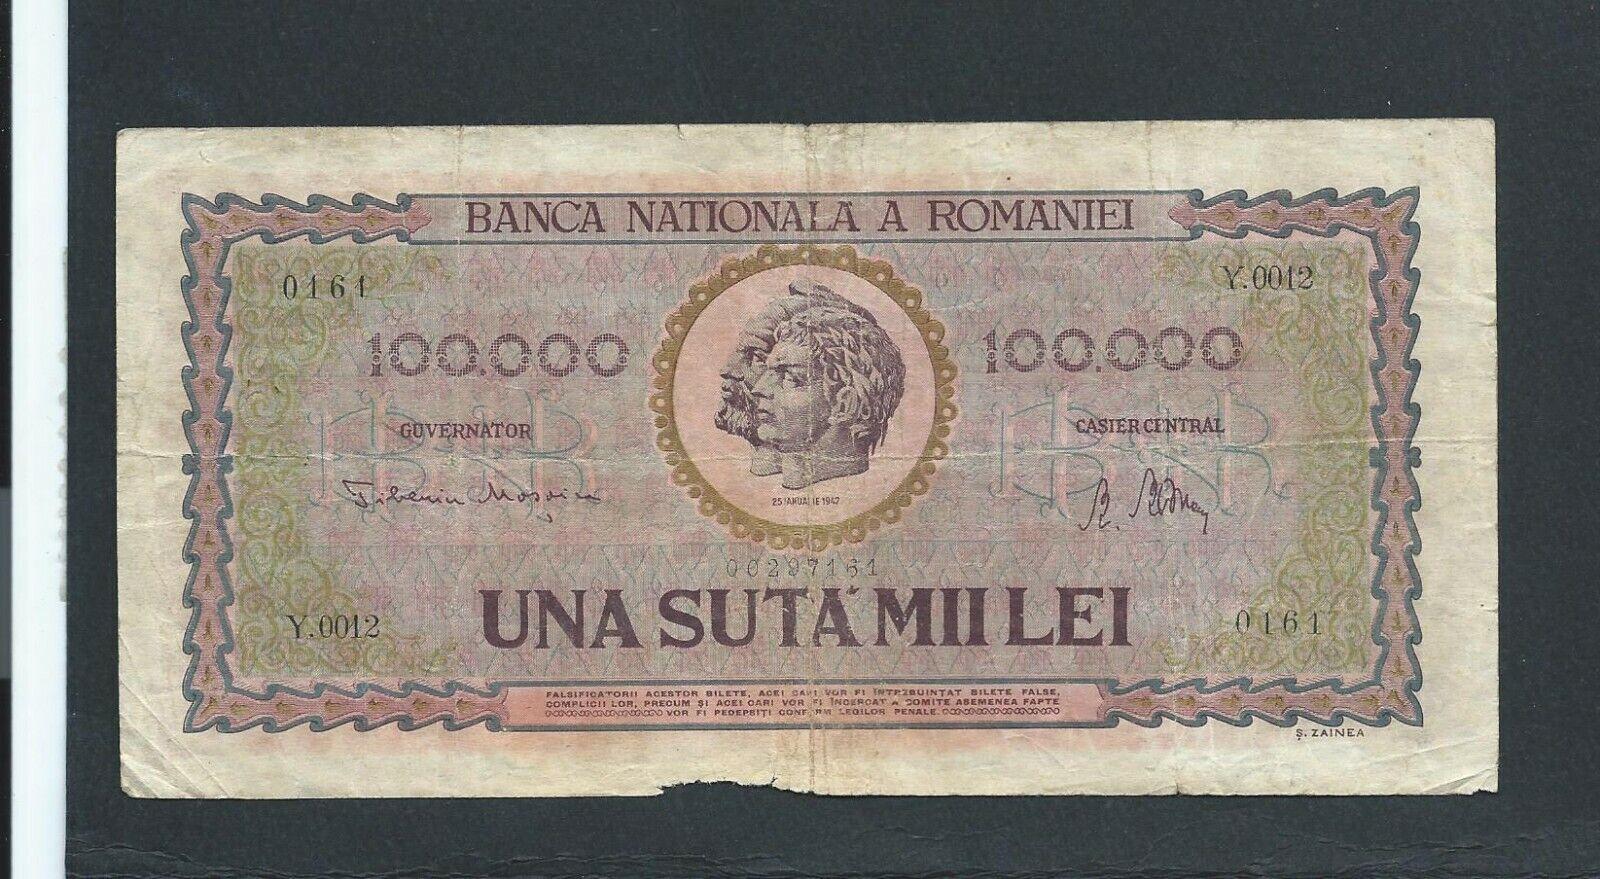 ROMANIA - 1947 - 100000 LEI Banknote P-59a - RARE TYPE Note - NR - $0.99